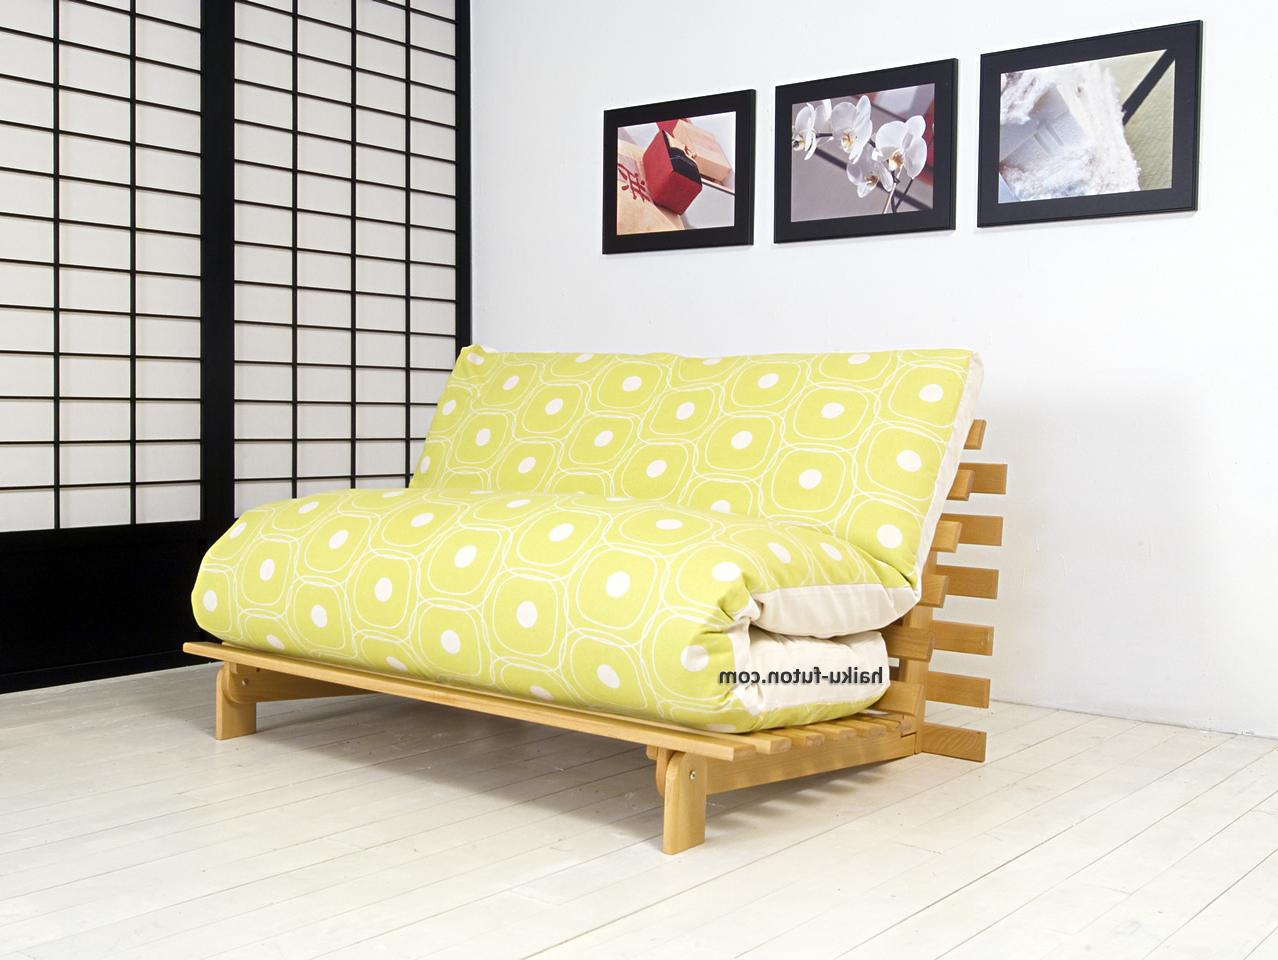 Sofa Cama Desplegable Drdp Futon sofà Cama Plegable sofà Cama De Madera Para Futon